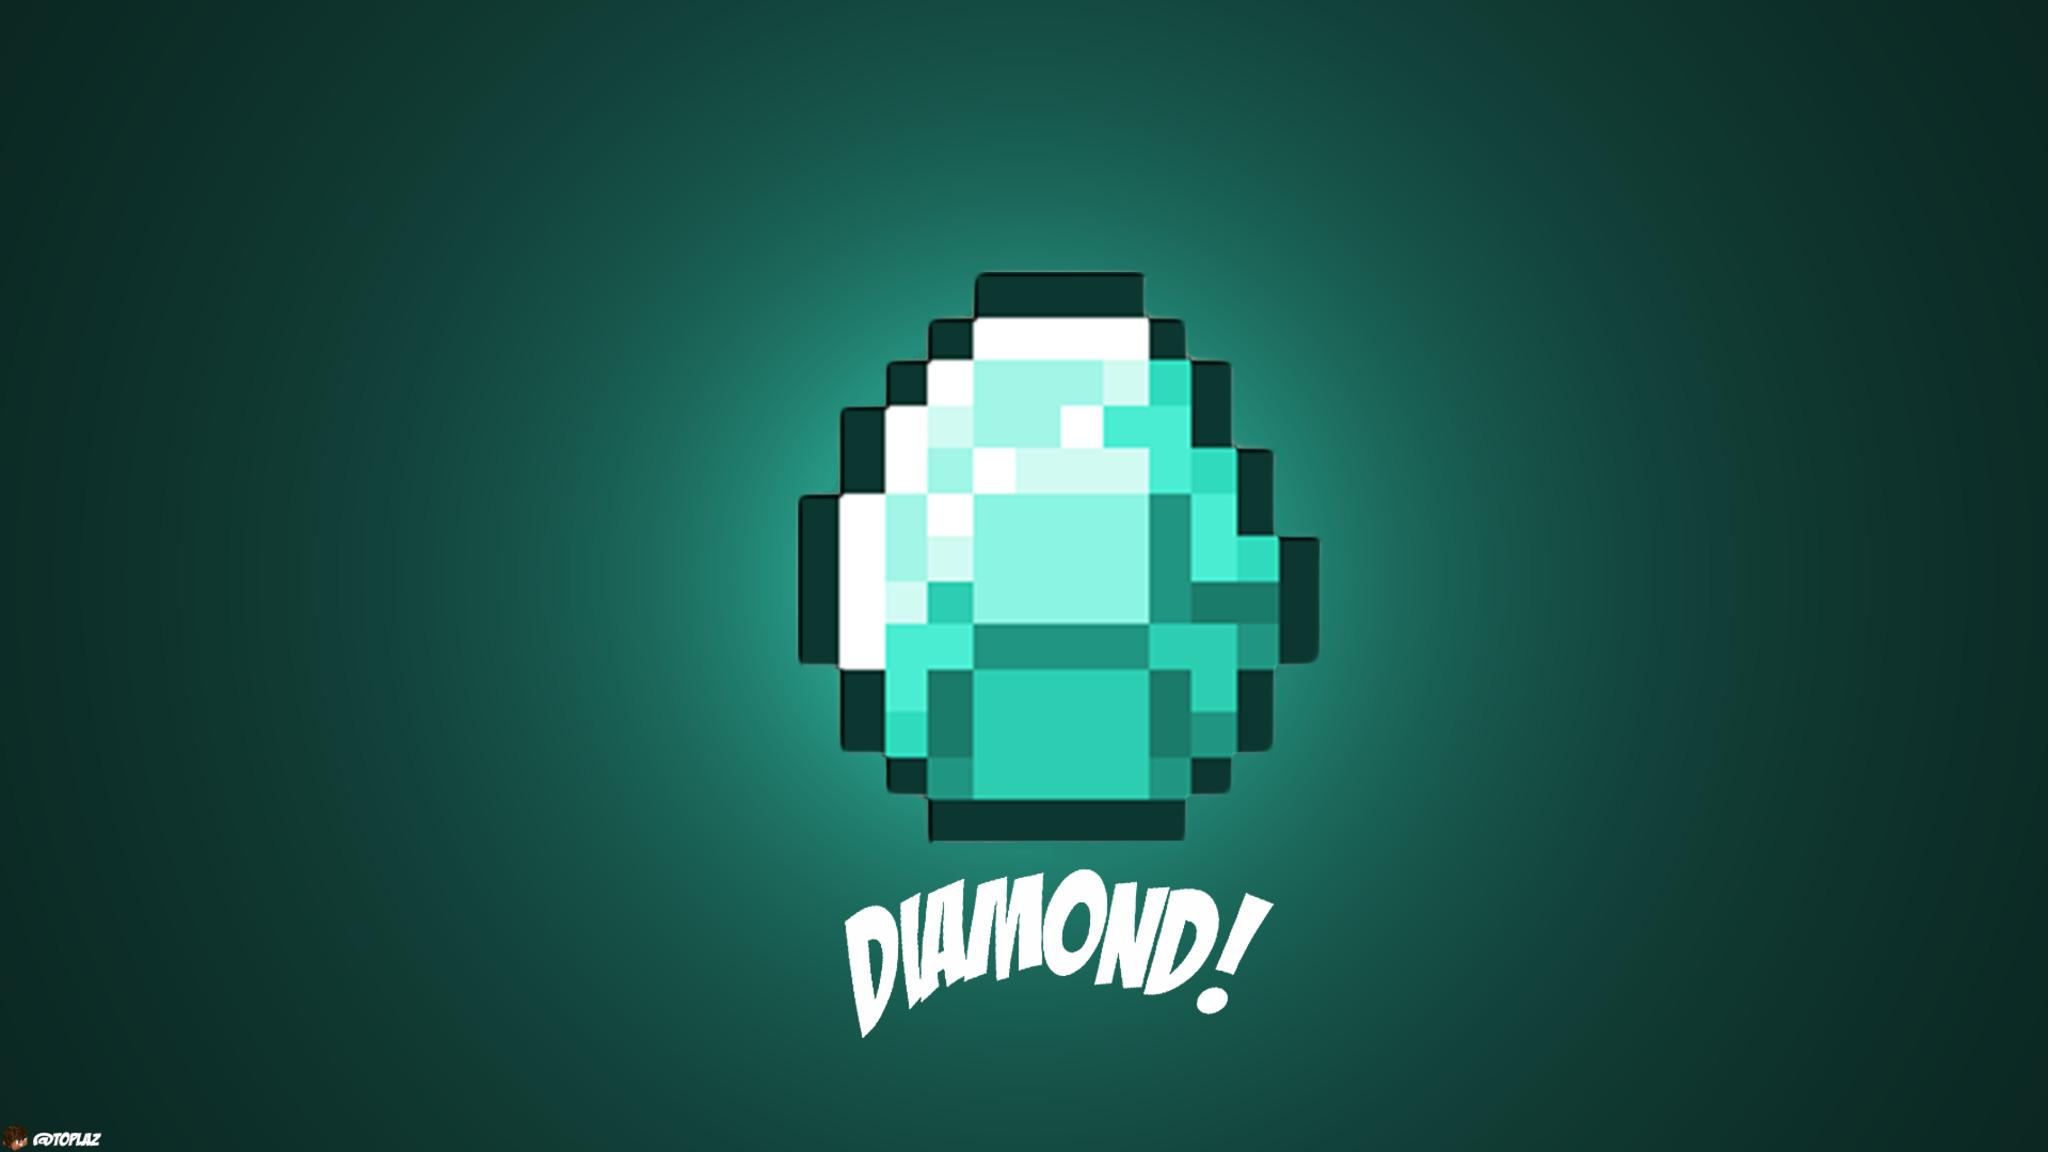 2048x1152 Diamond Minecraft 2048x1152 Resolution Hd 4k Wallpapers